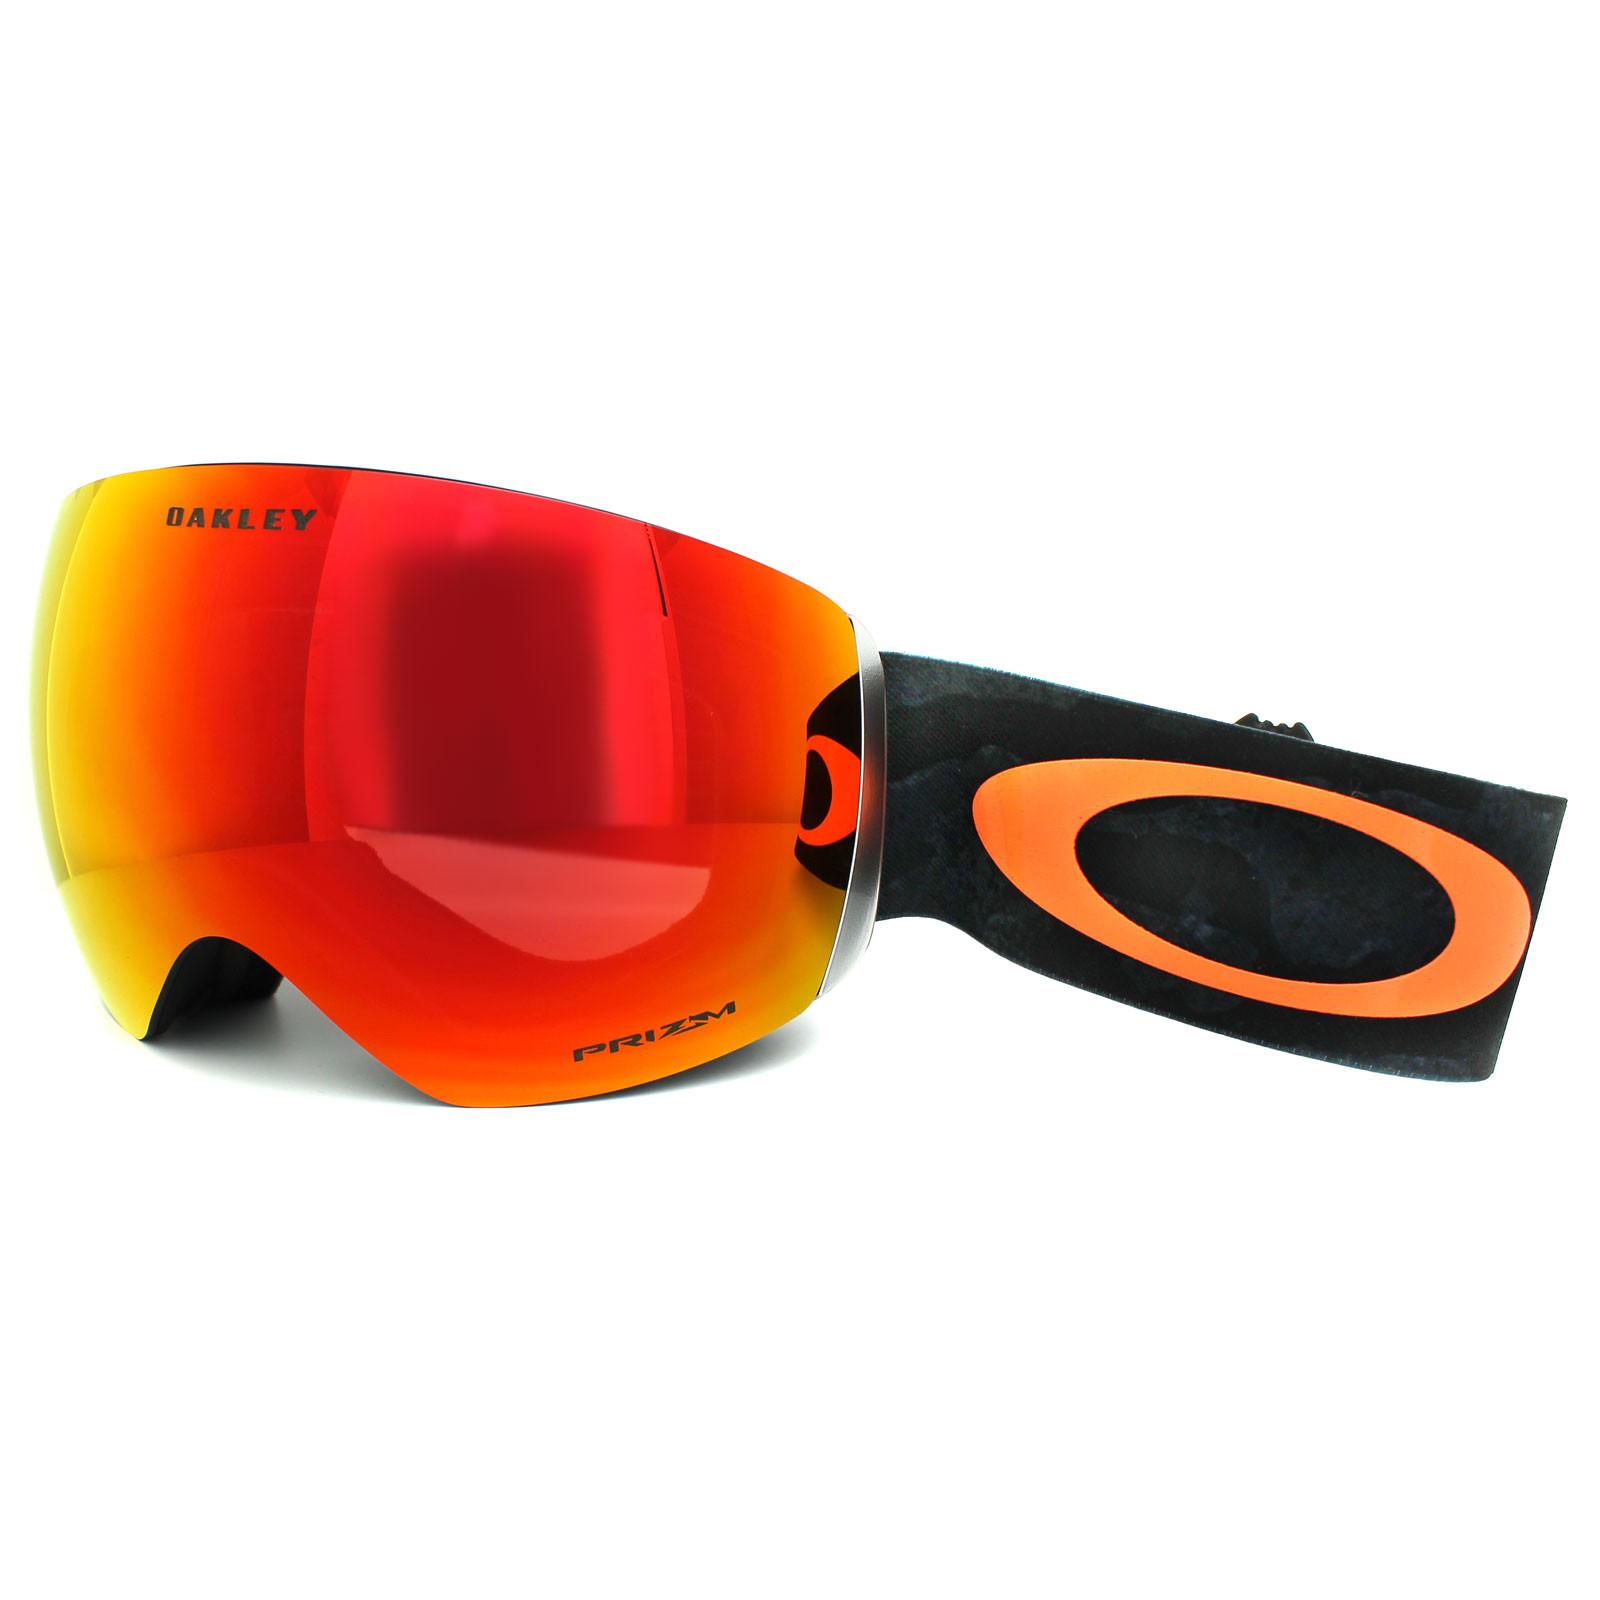 Oakley Flight Deck  Oakley Ski Snow Goggles Flight Deck OO7050 24 Camo Orange